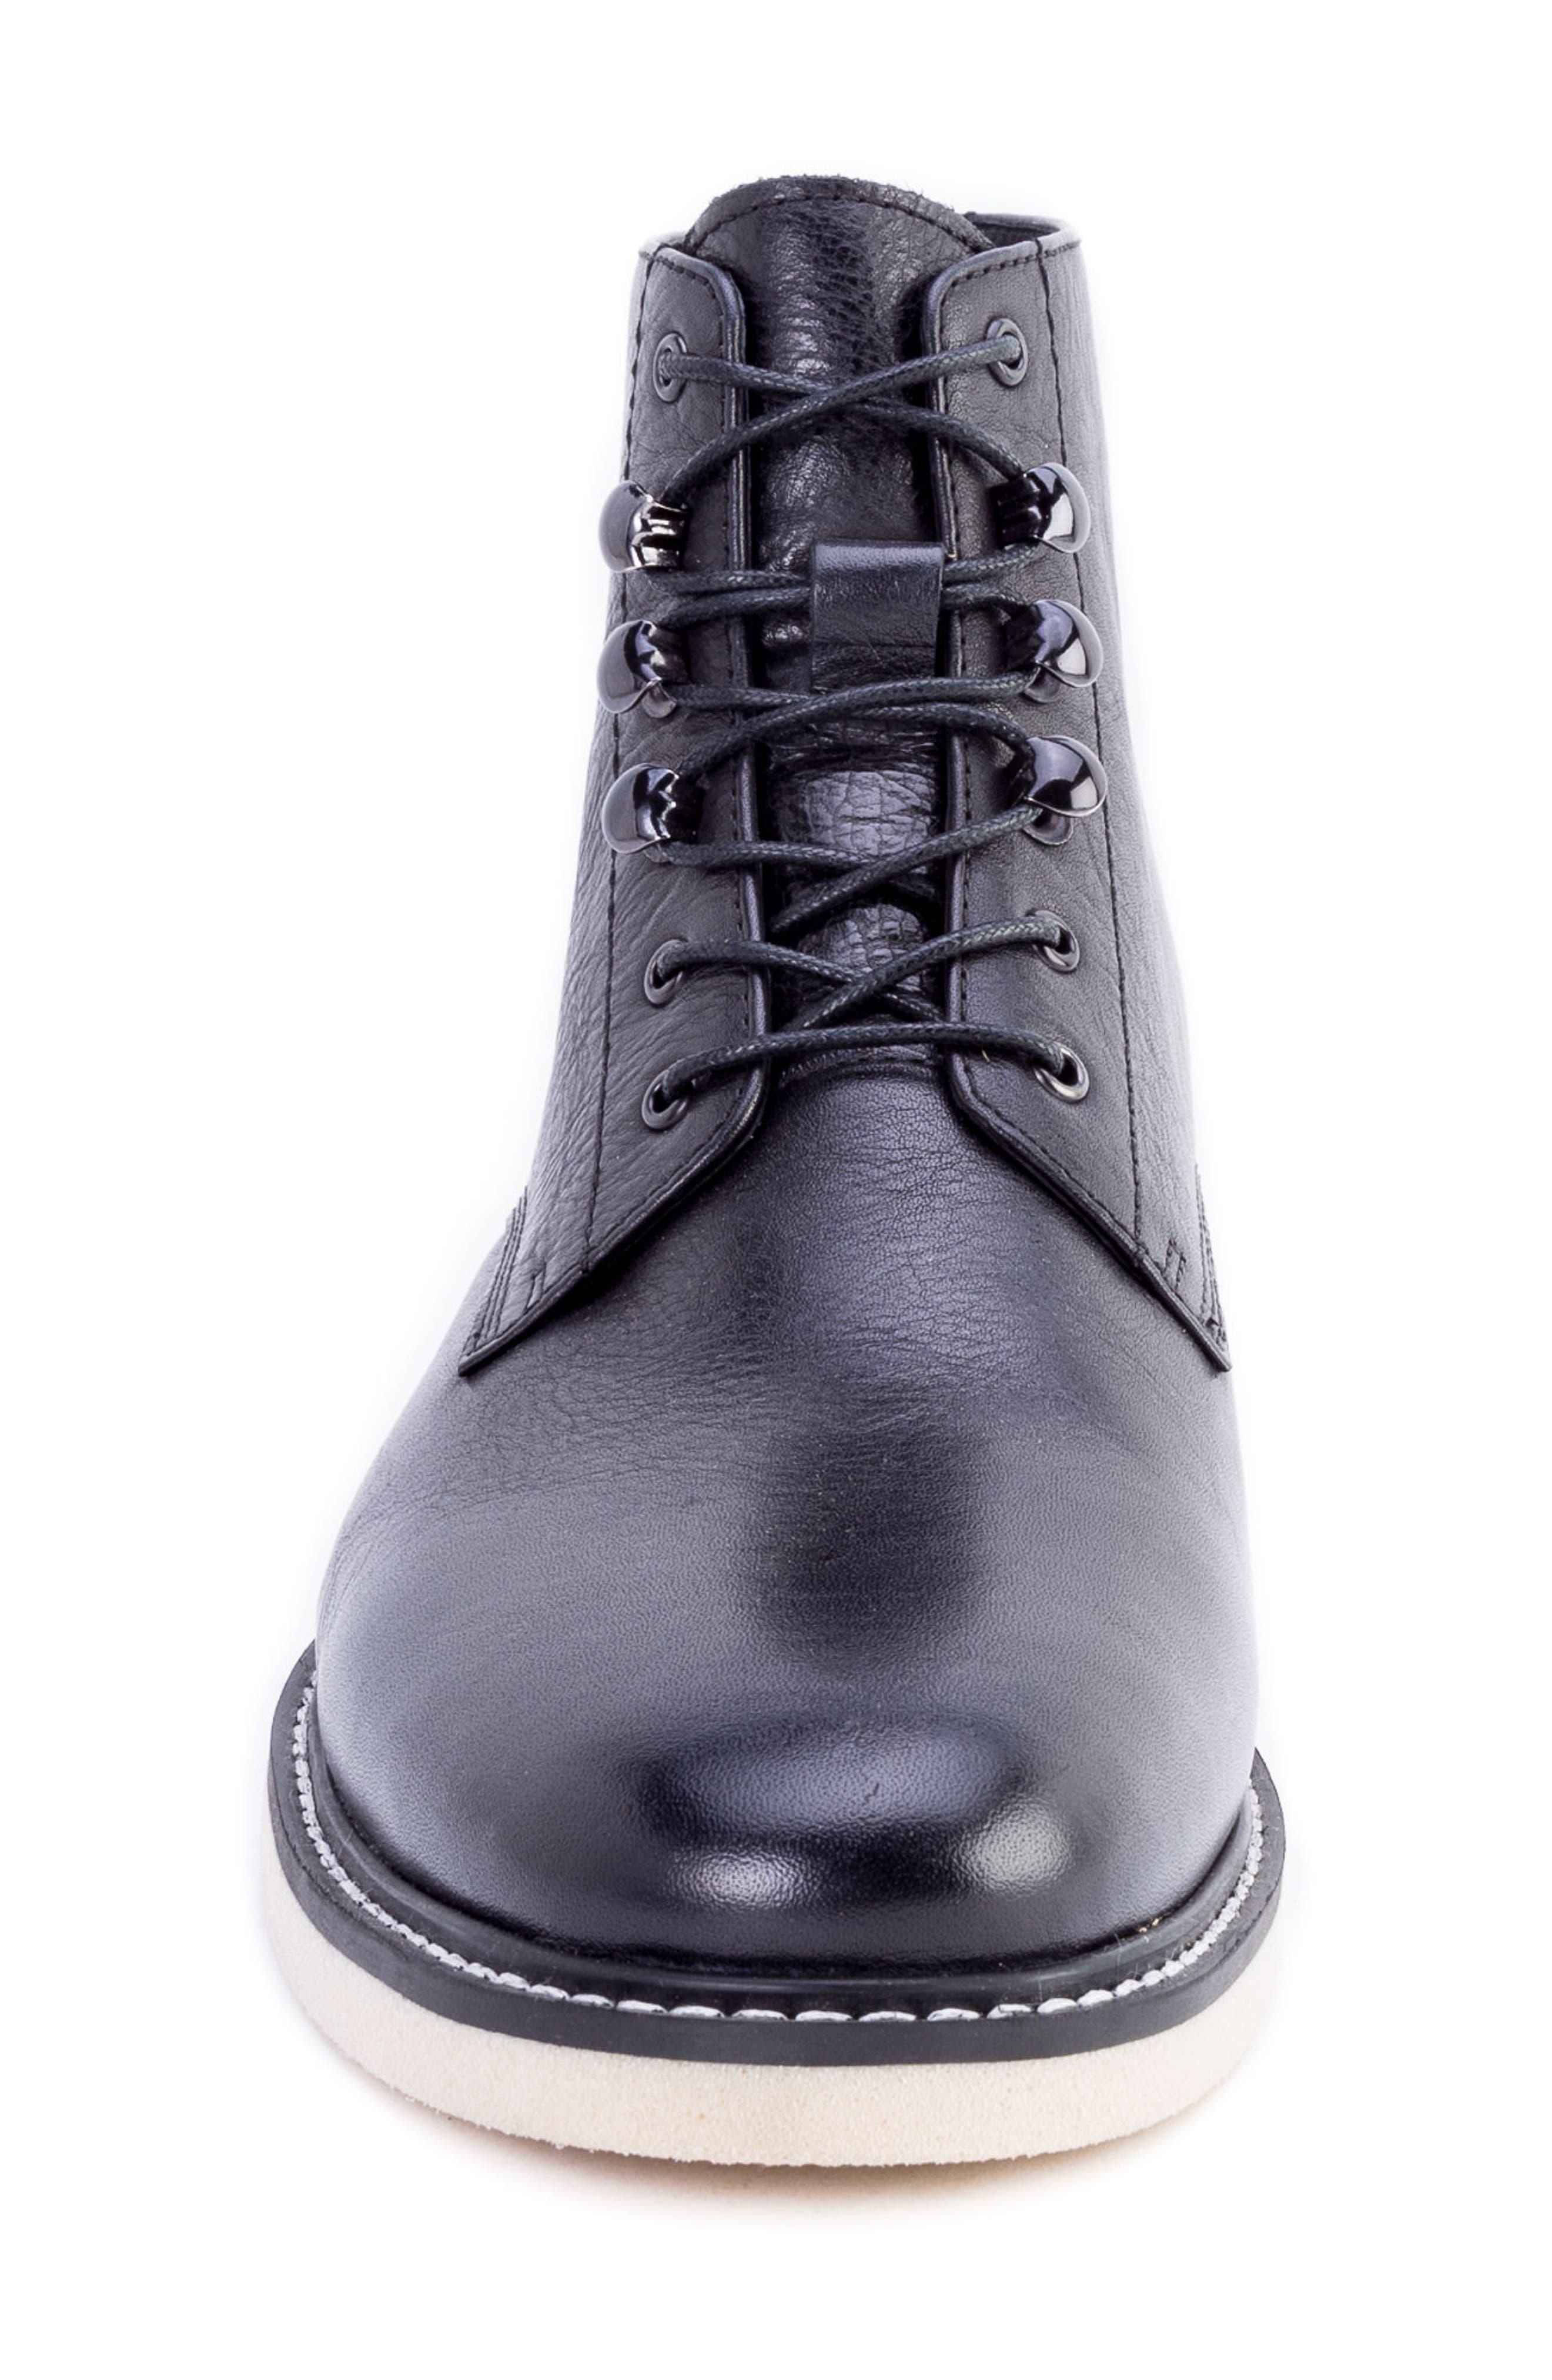 Finch Plain Toe Boot,                             Alternate thumbnail 4, color,                             BLACK LEATHER